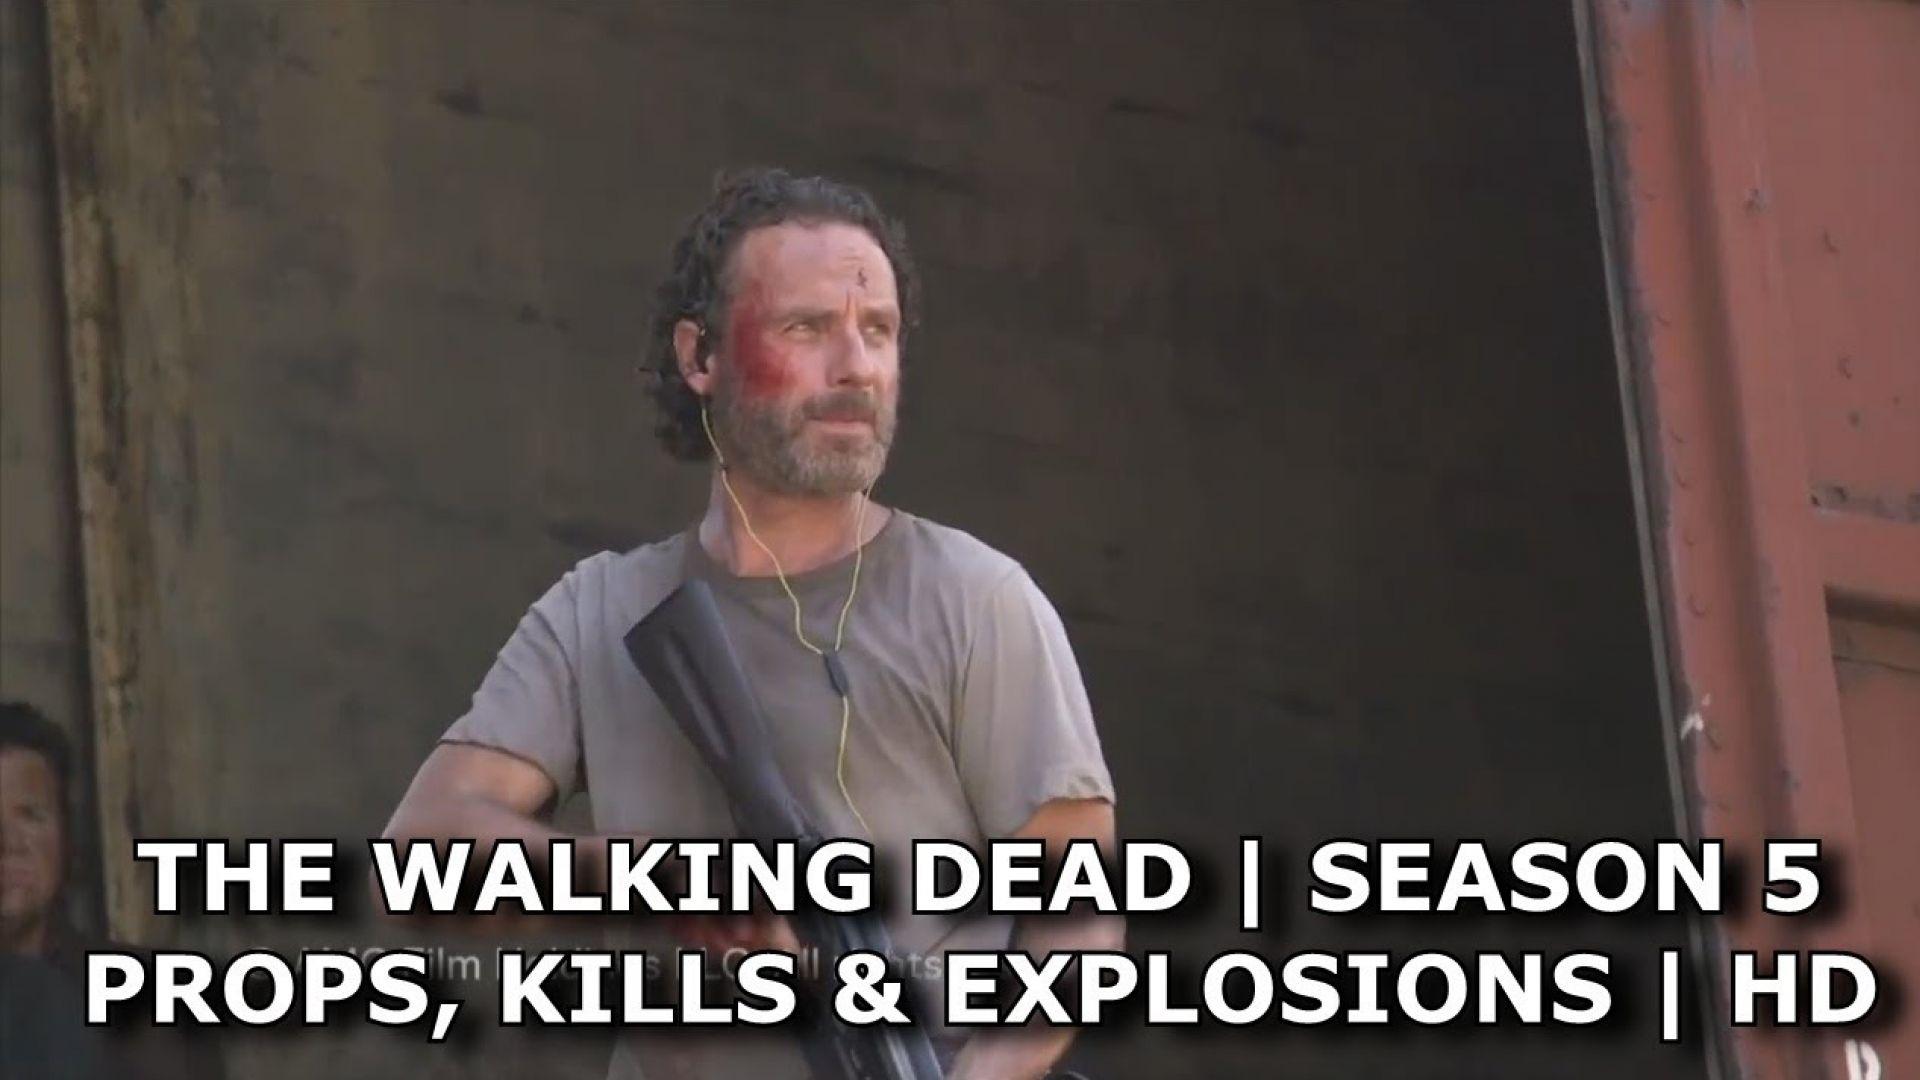 The Walking Dead Season 5: Behind The Scenes Props, Kills an